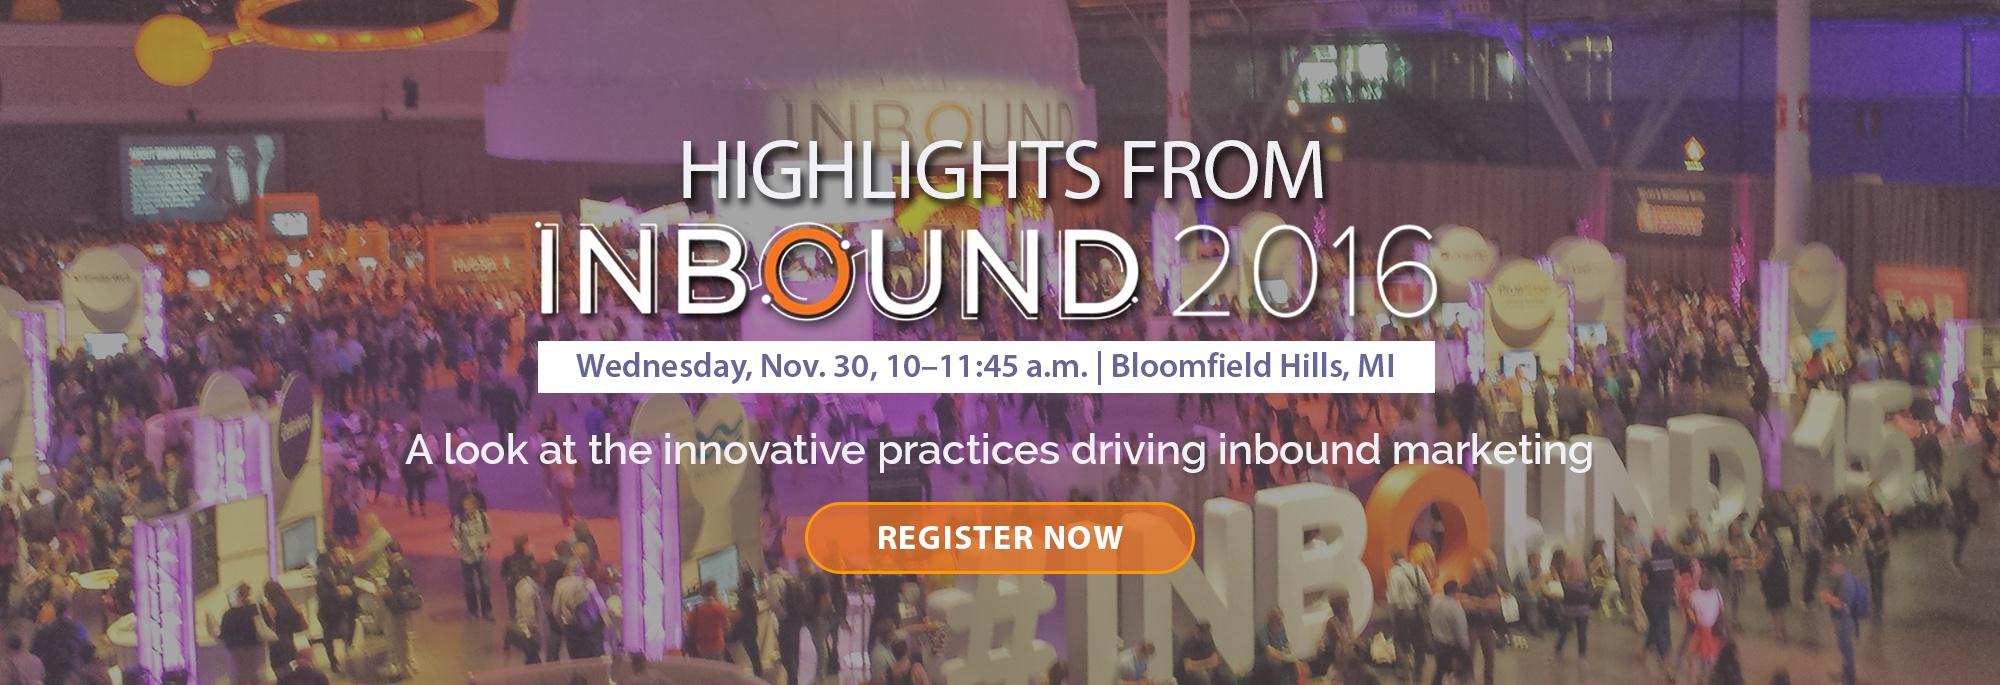 Highlights of Inbound 2016 Event